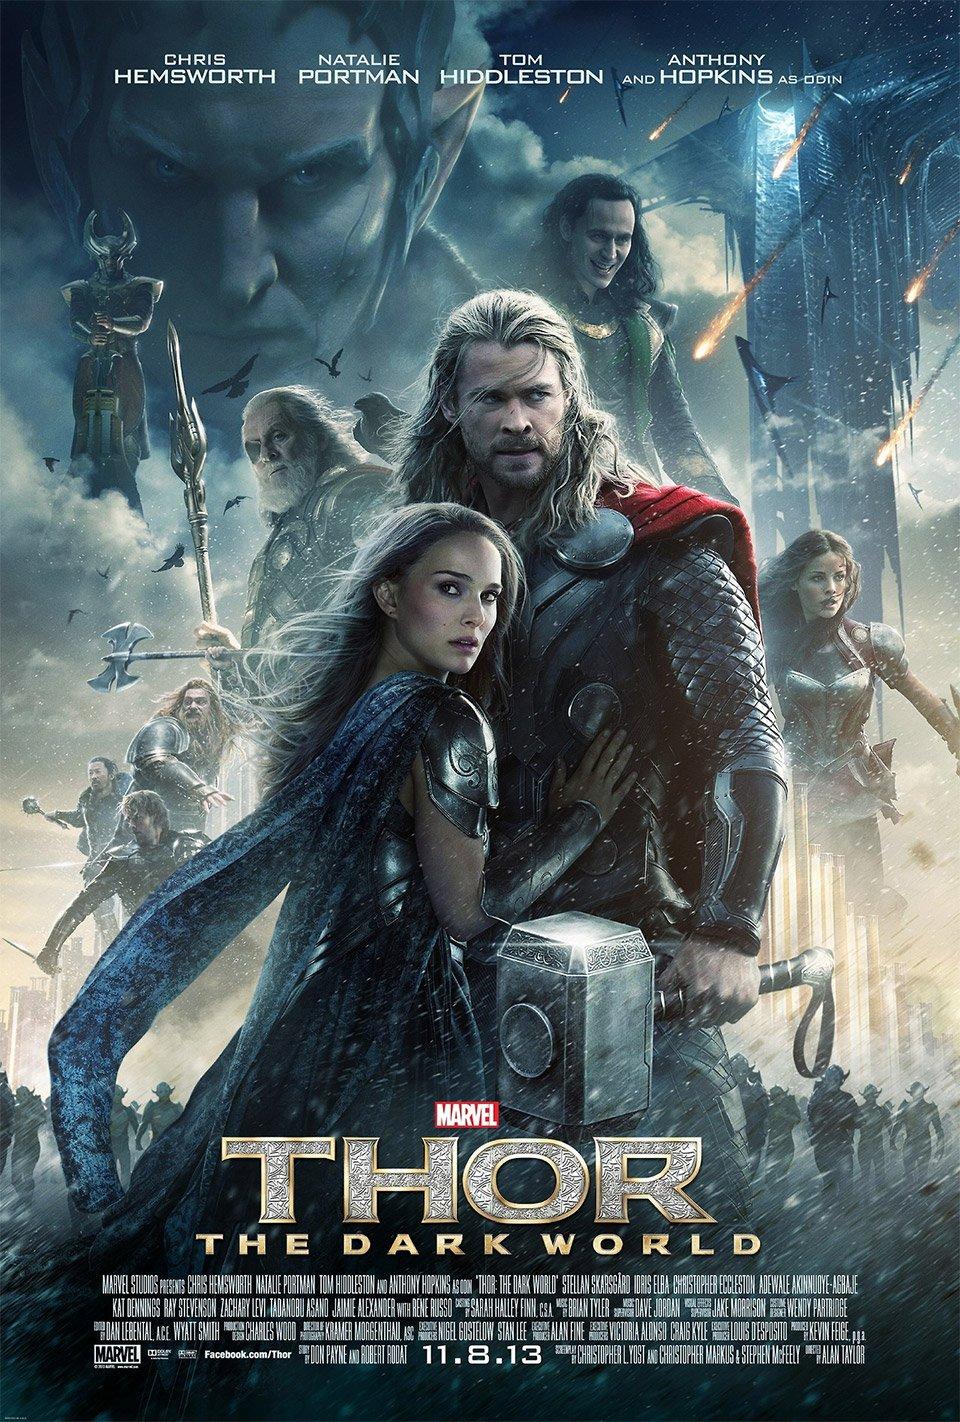 Thor: The Dark World Movie Posters